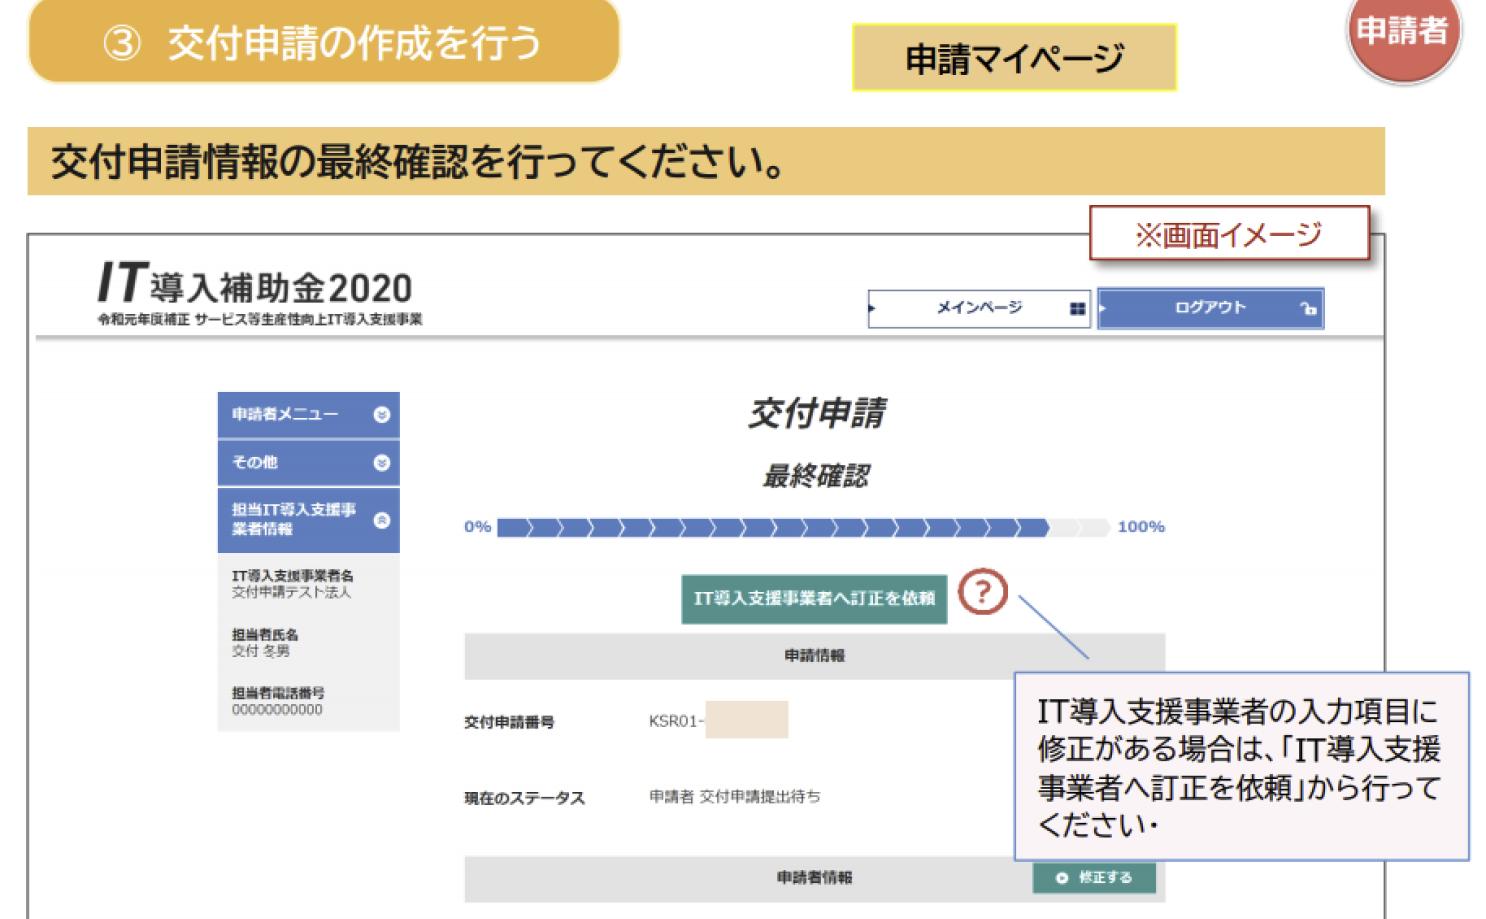 IT導入補助金交付申請提出のスクリーンショット